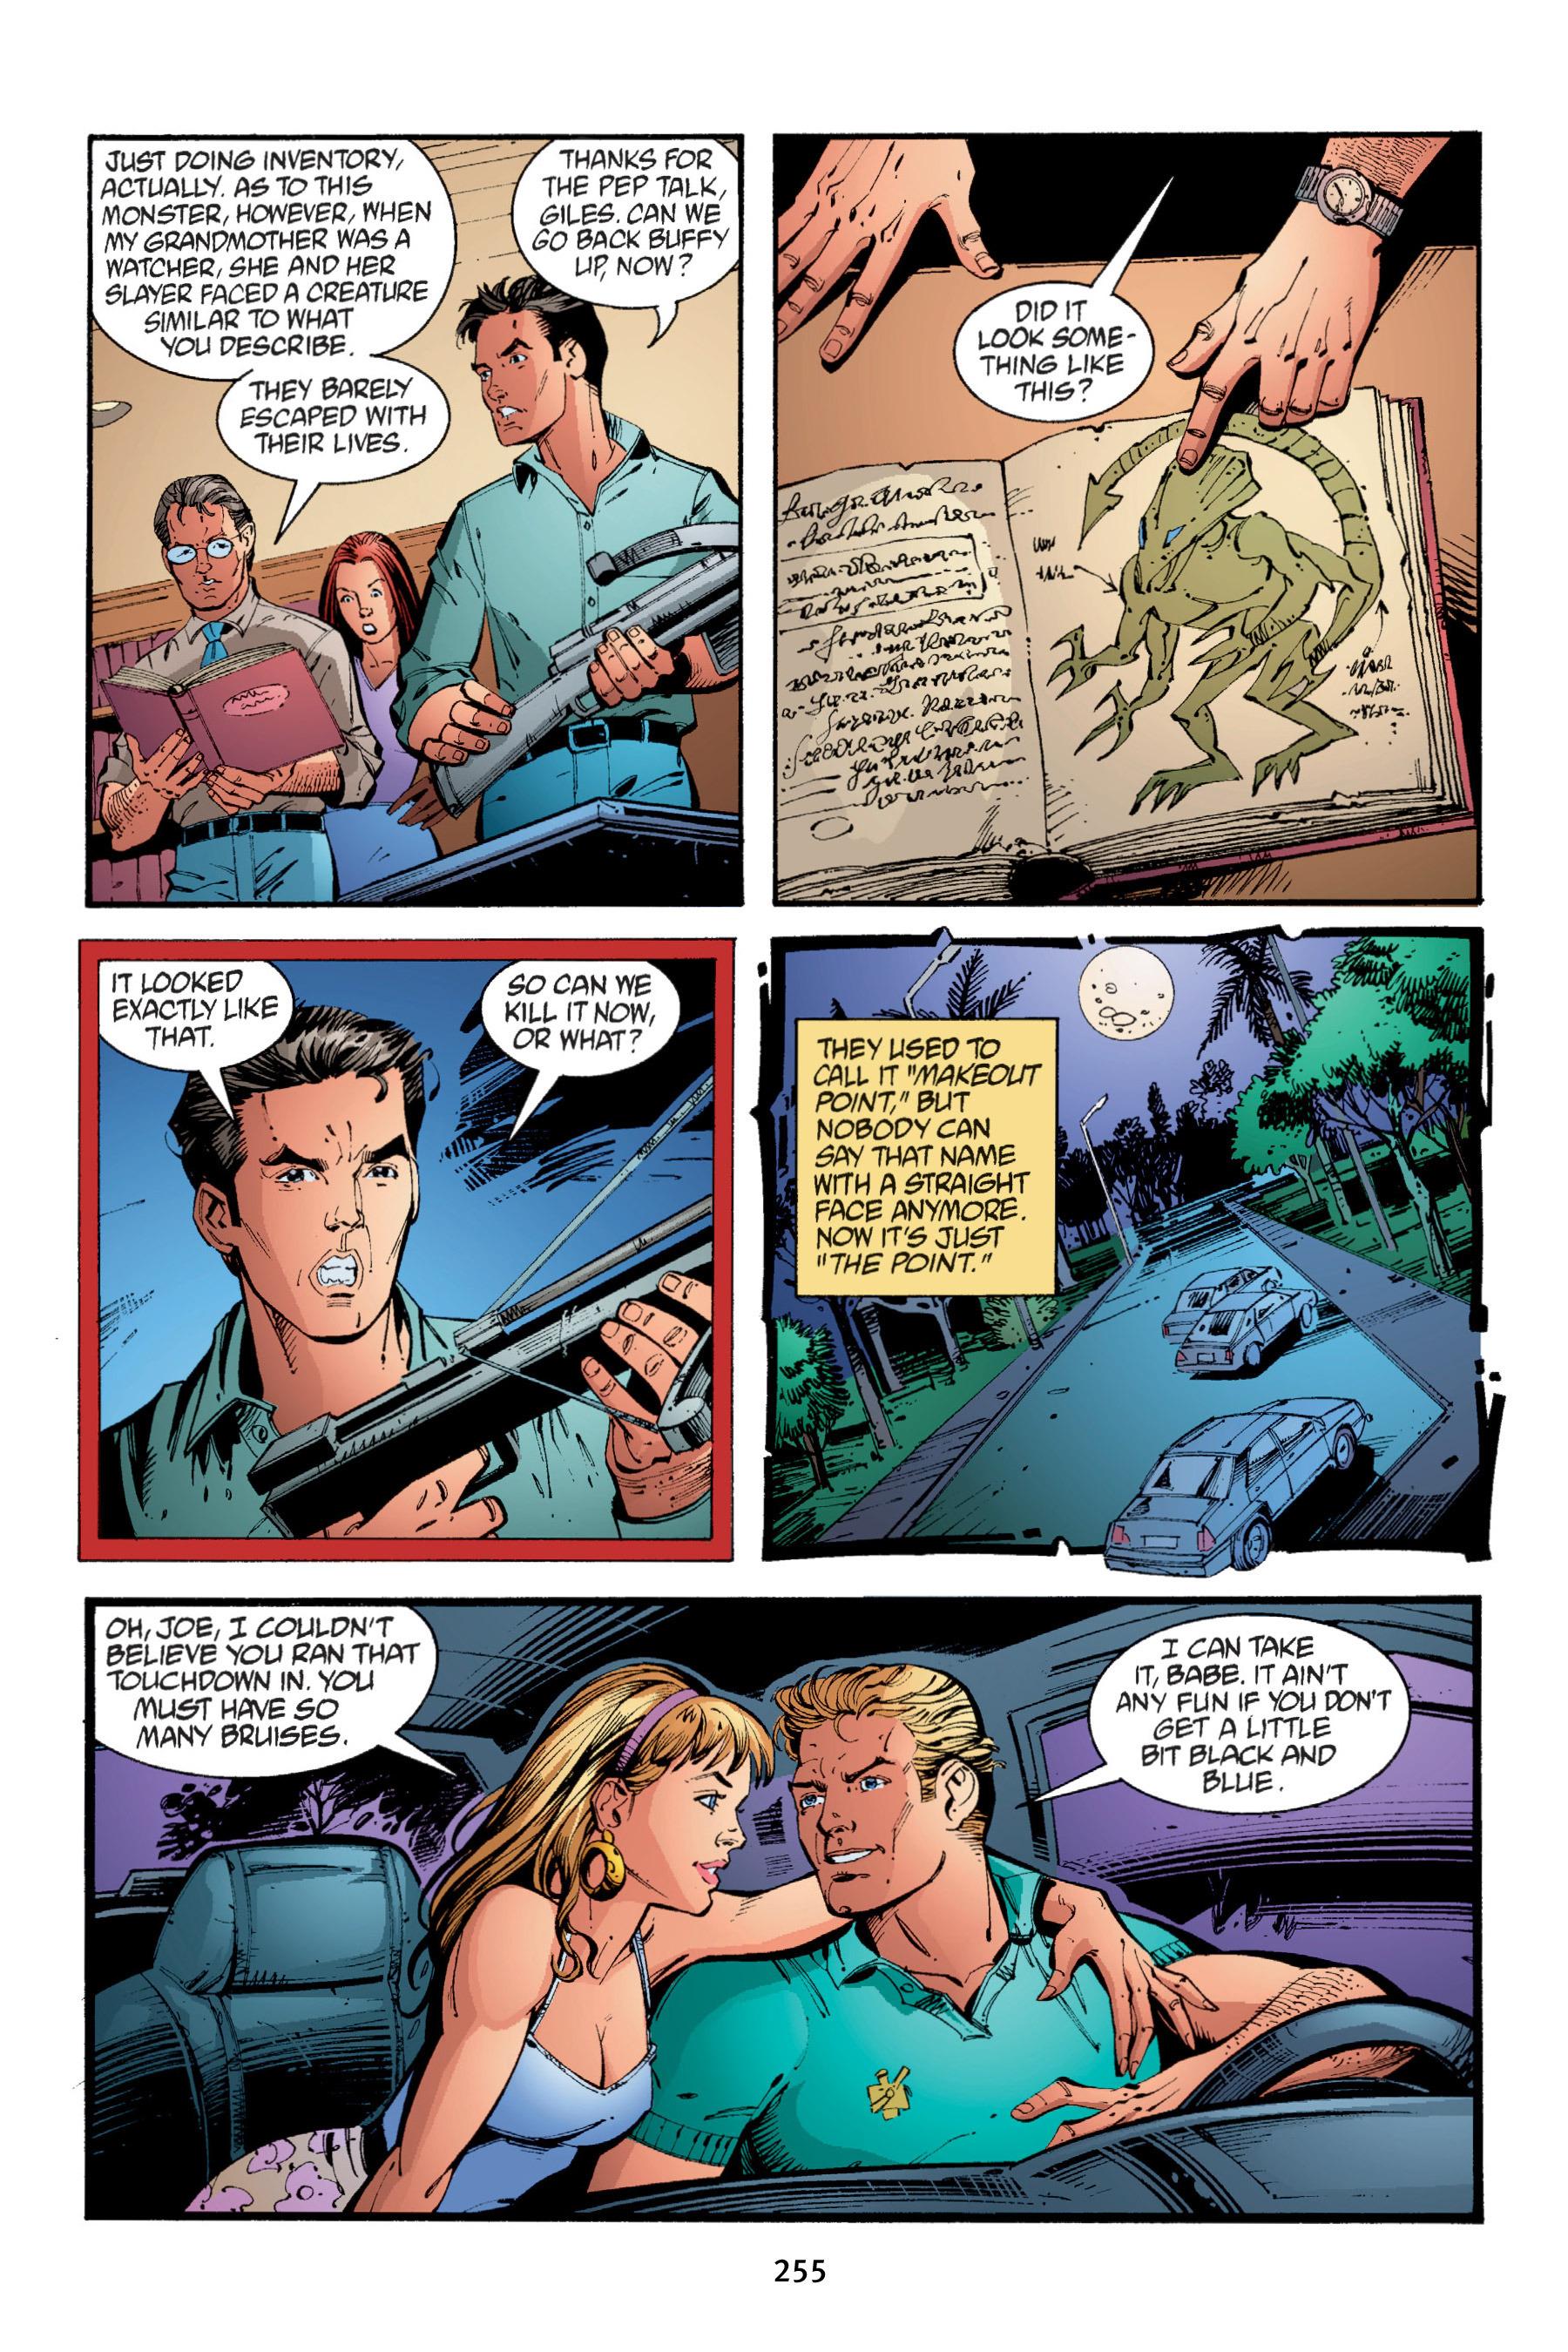 Read online Buffy the Vampire Slayer: Omnibus comic -  Issue # TPB 4 - 253